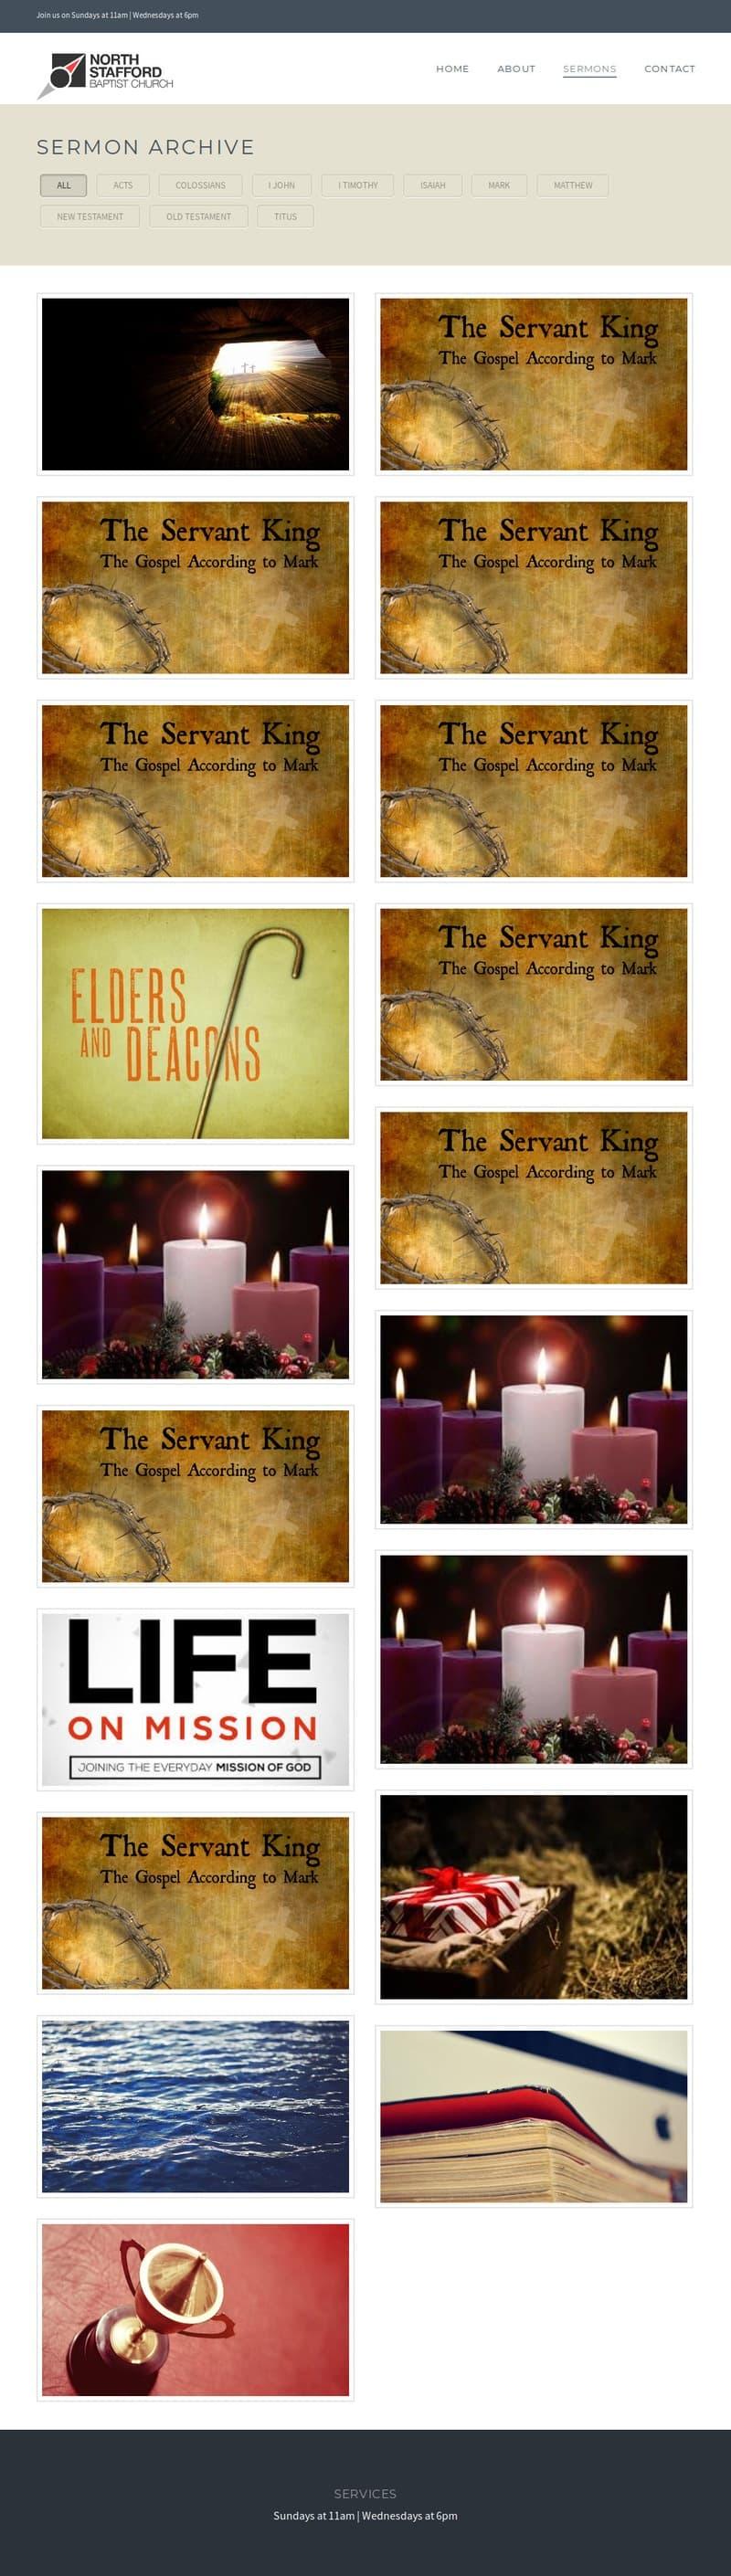 sermons-page